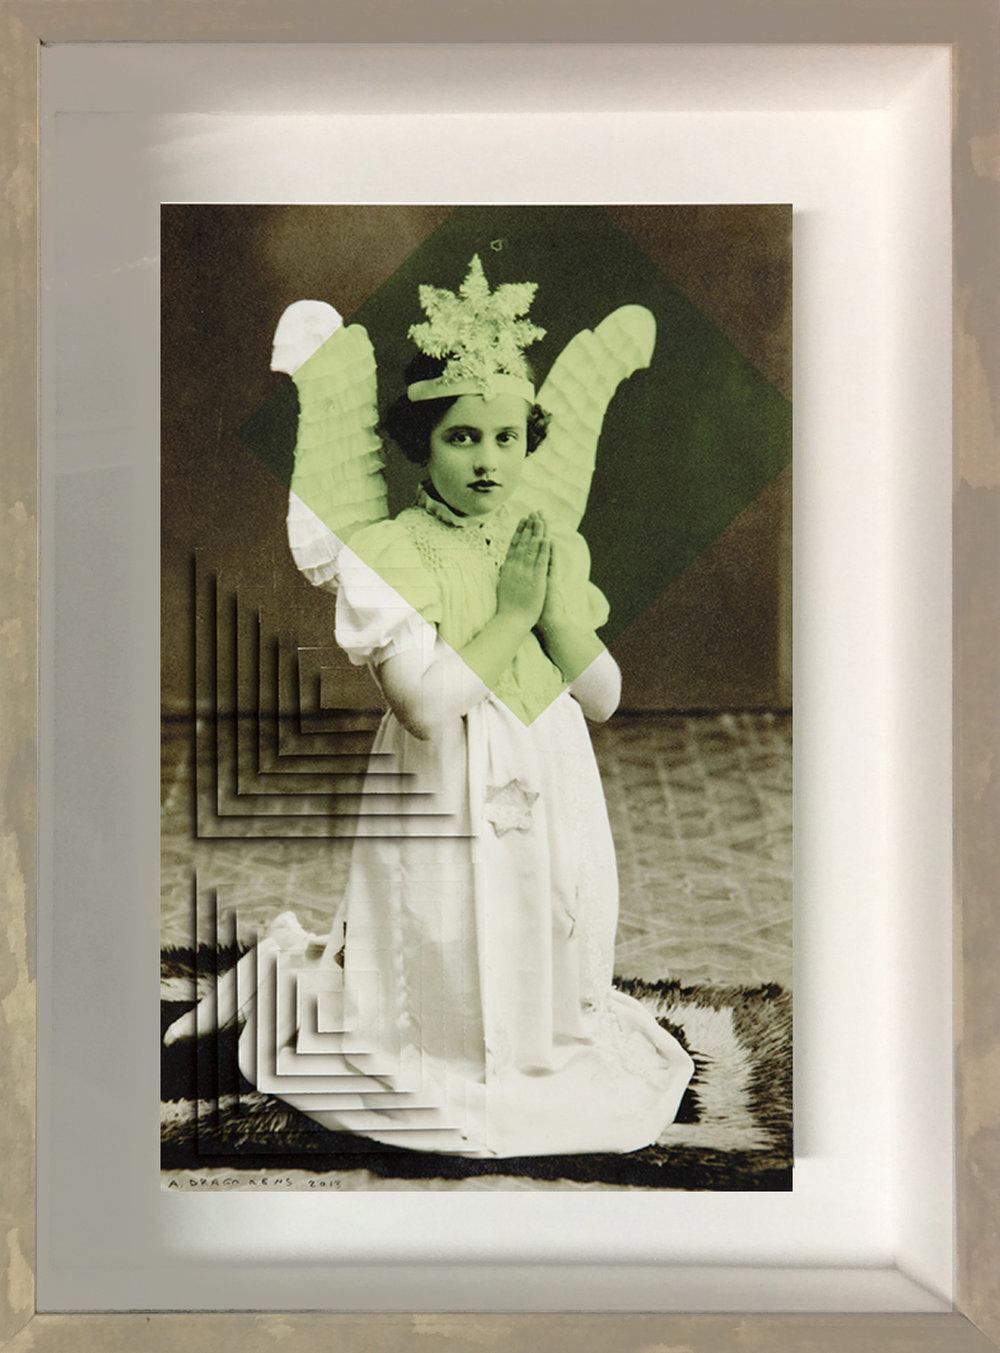 40. Galleria-l'Affiche_Alfred-Drago-Rens_Angioletto-bulgaro#2_2013_31,3x22,8cm.jpg